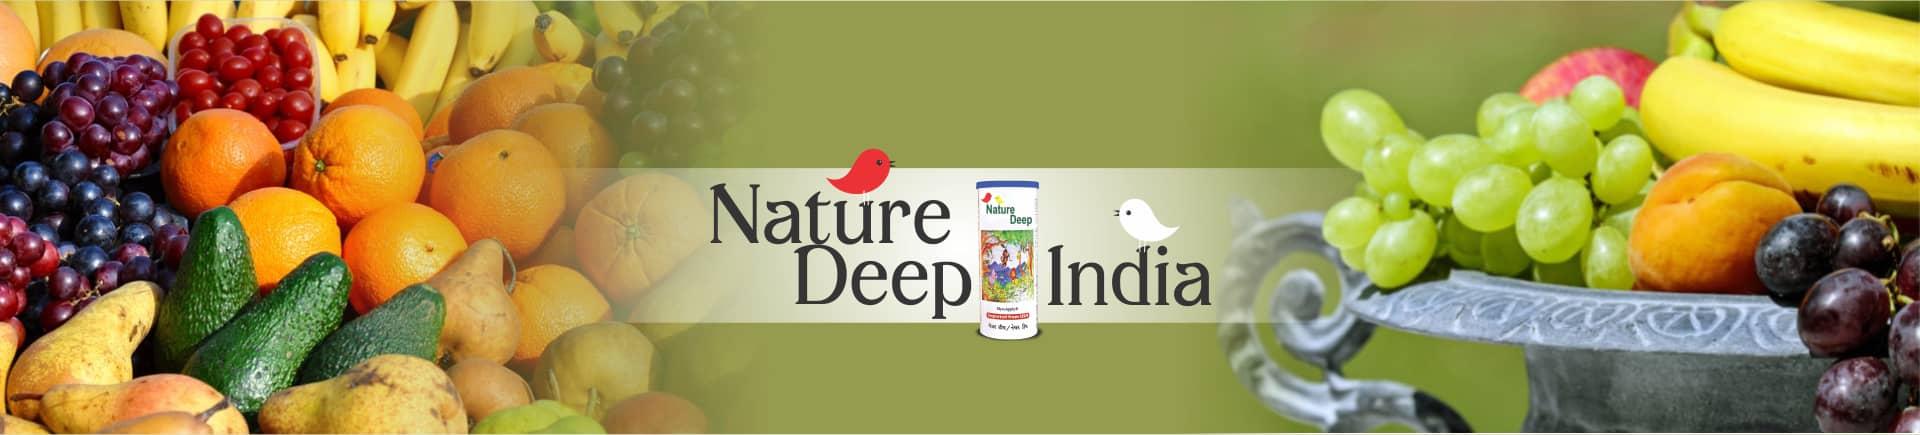 sumitomo naturedeep for other fruits crop desktop banner